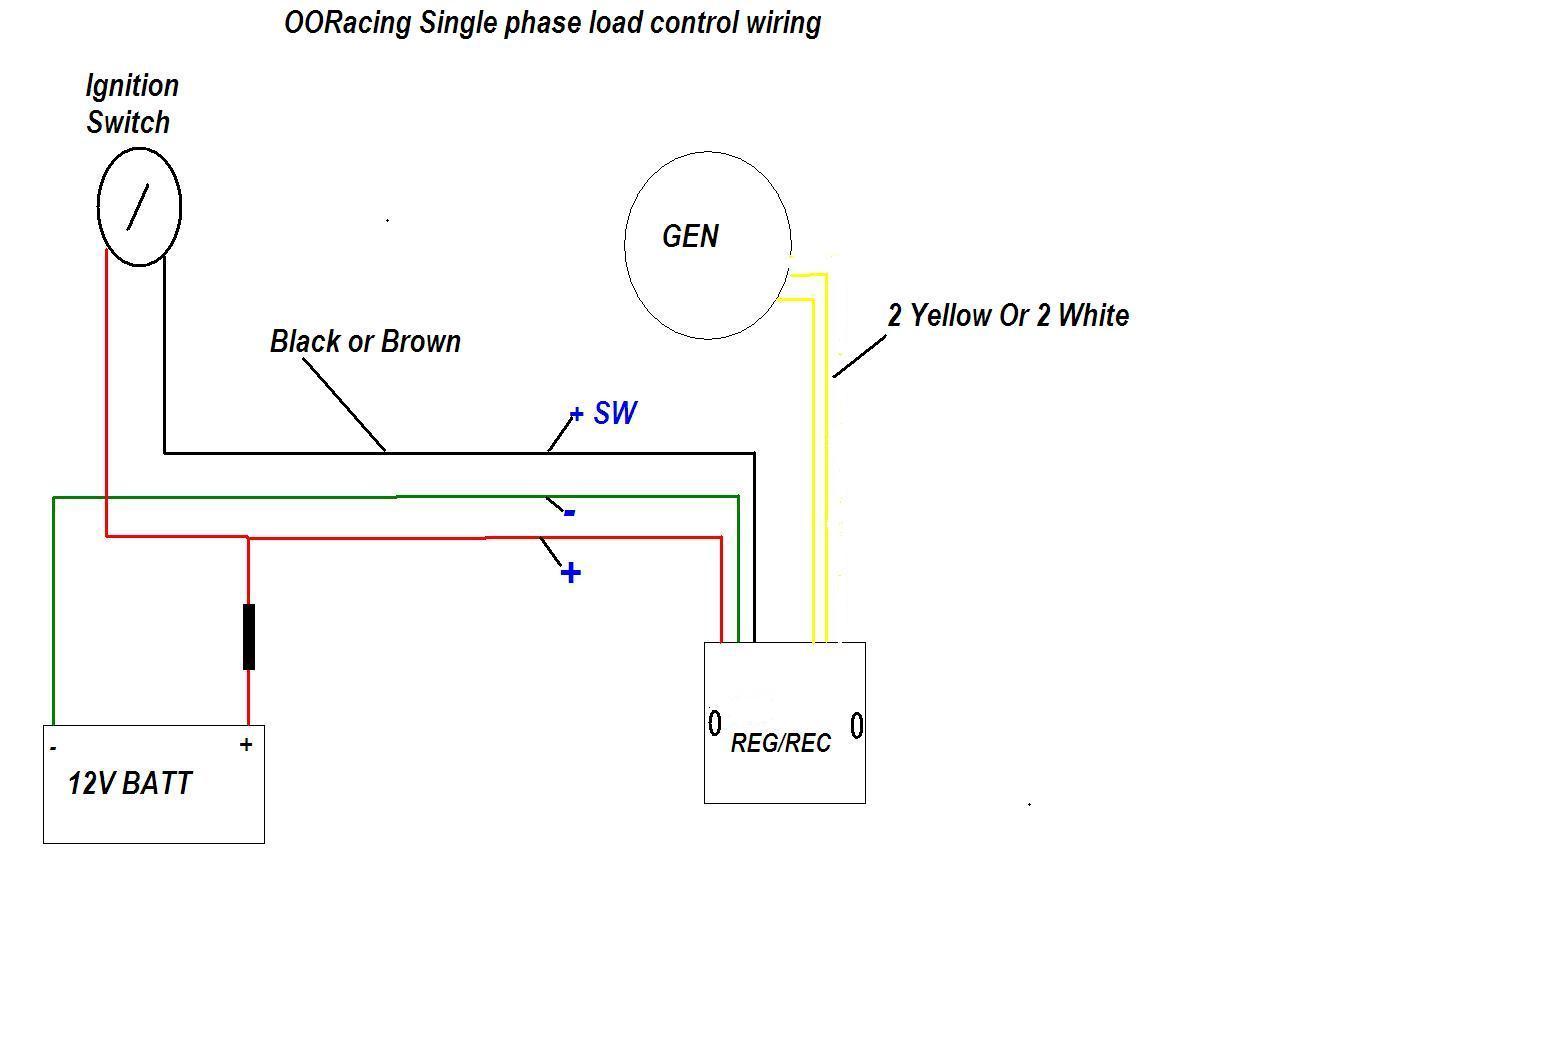 NB_7160] Panterra 125 Dirt Bike Wiring Diagram Download DiagramOsoph Oxyt Astic Iosco Dness Plan Boapu Mohammedshrine Librar Wiring 101